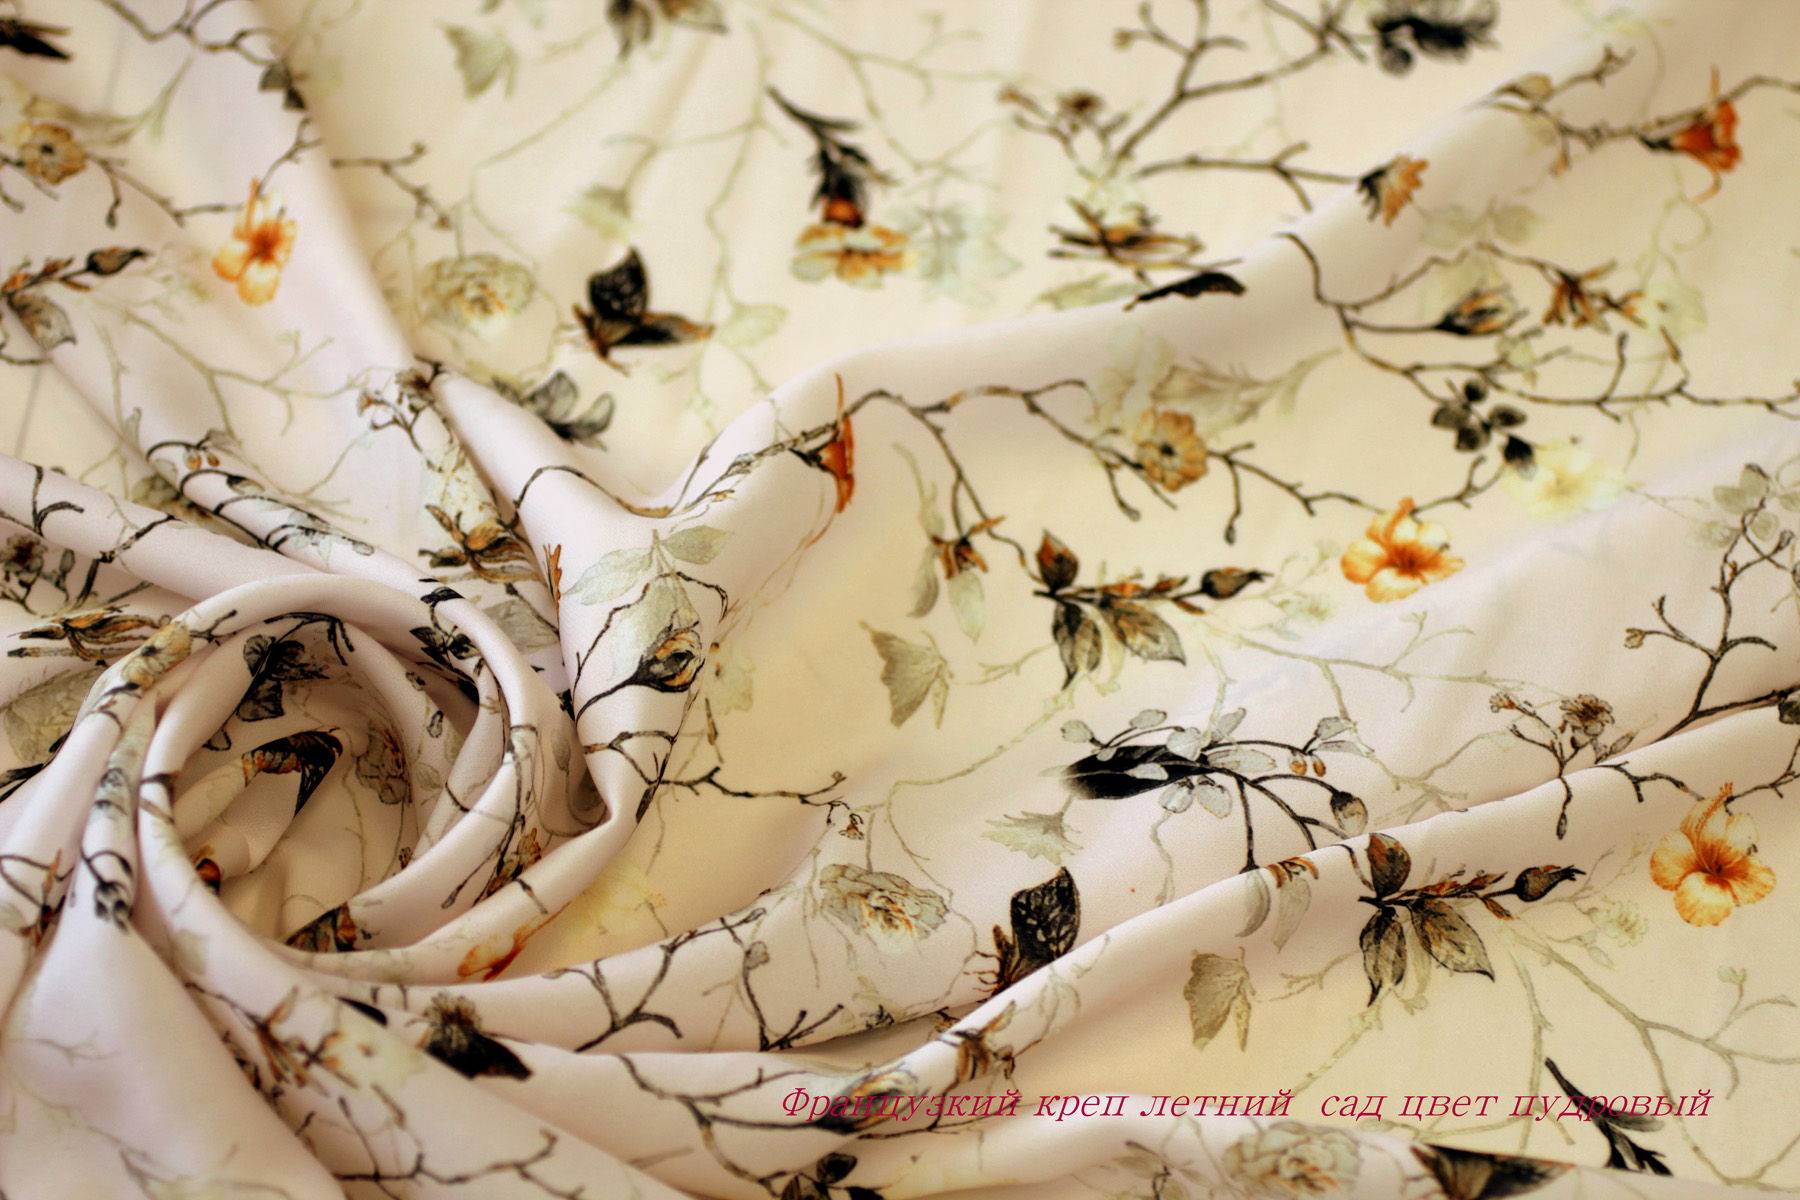 Французский креп Летний сад цвет пудровый